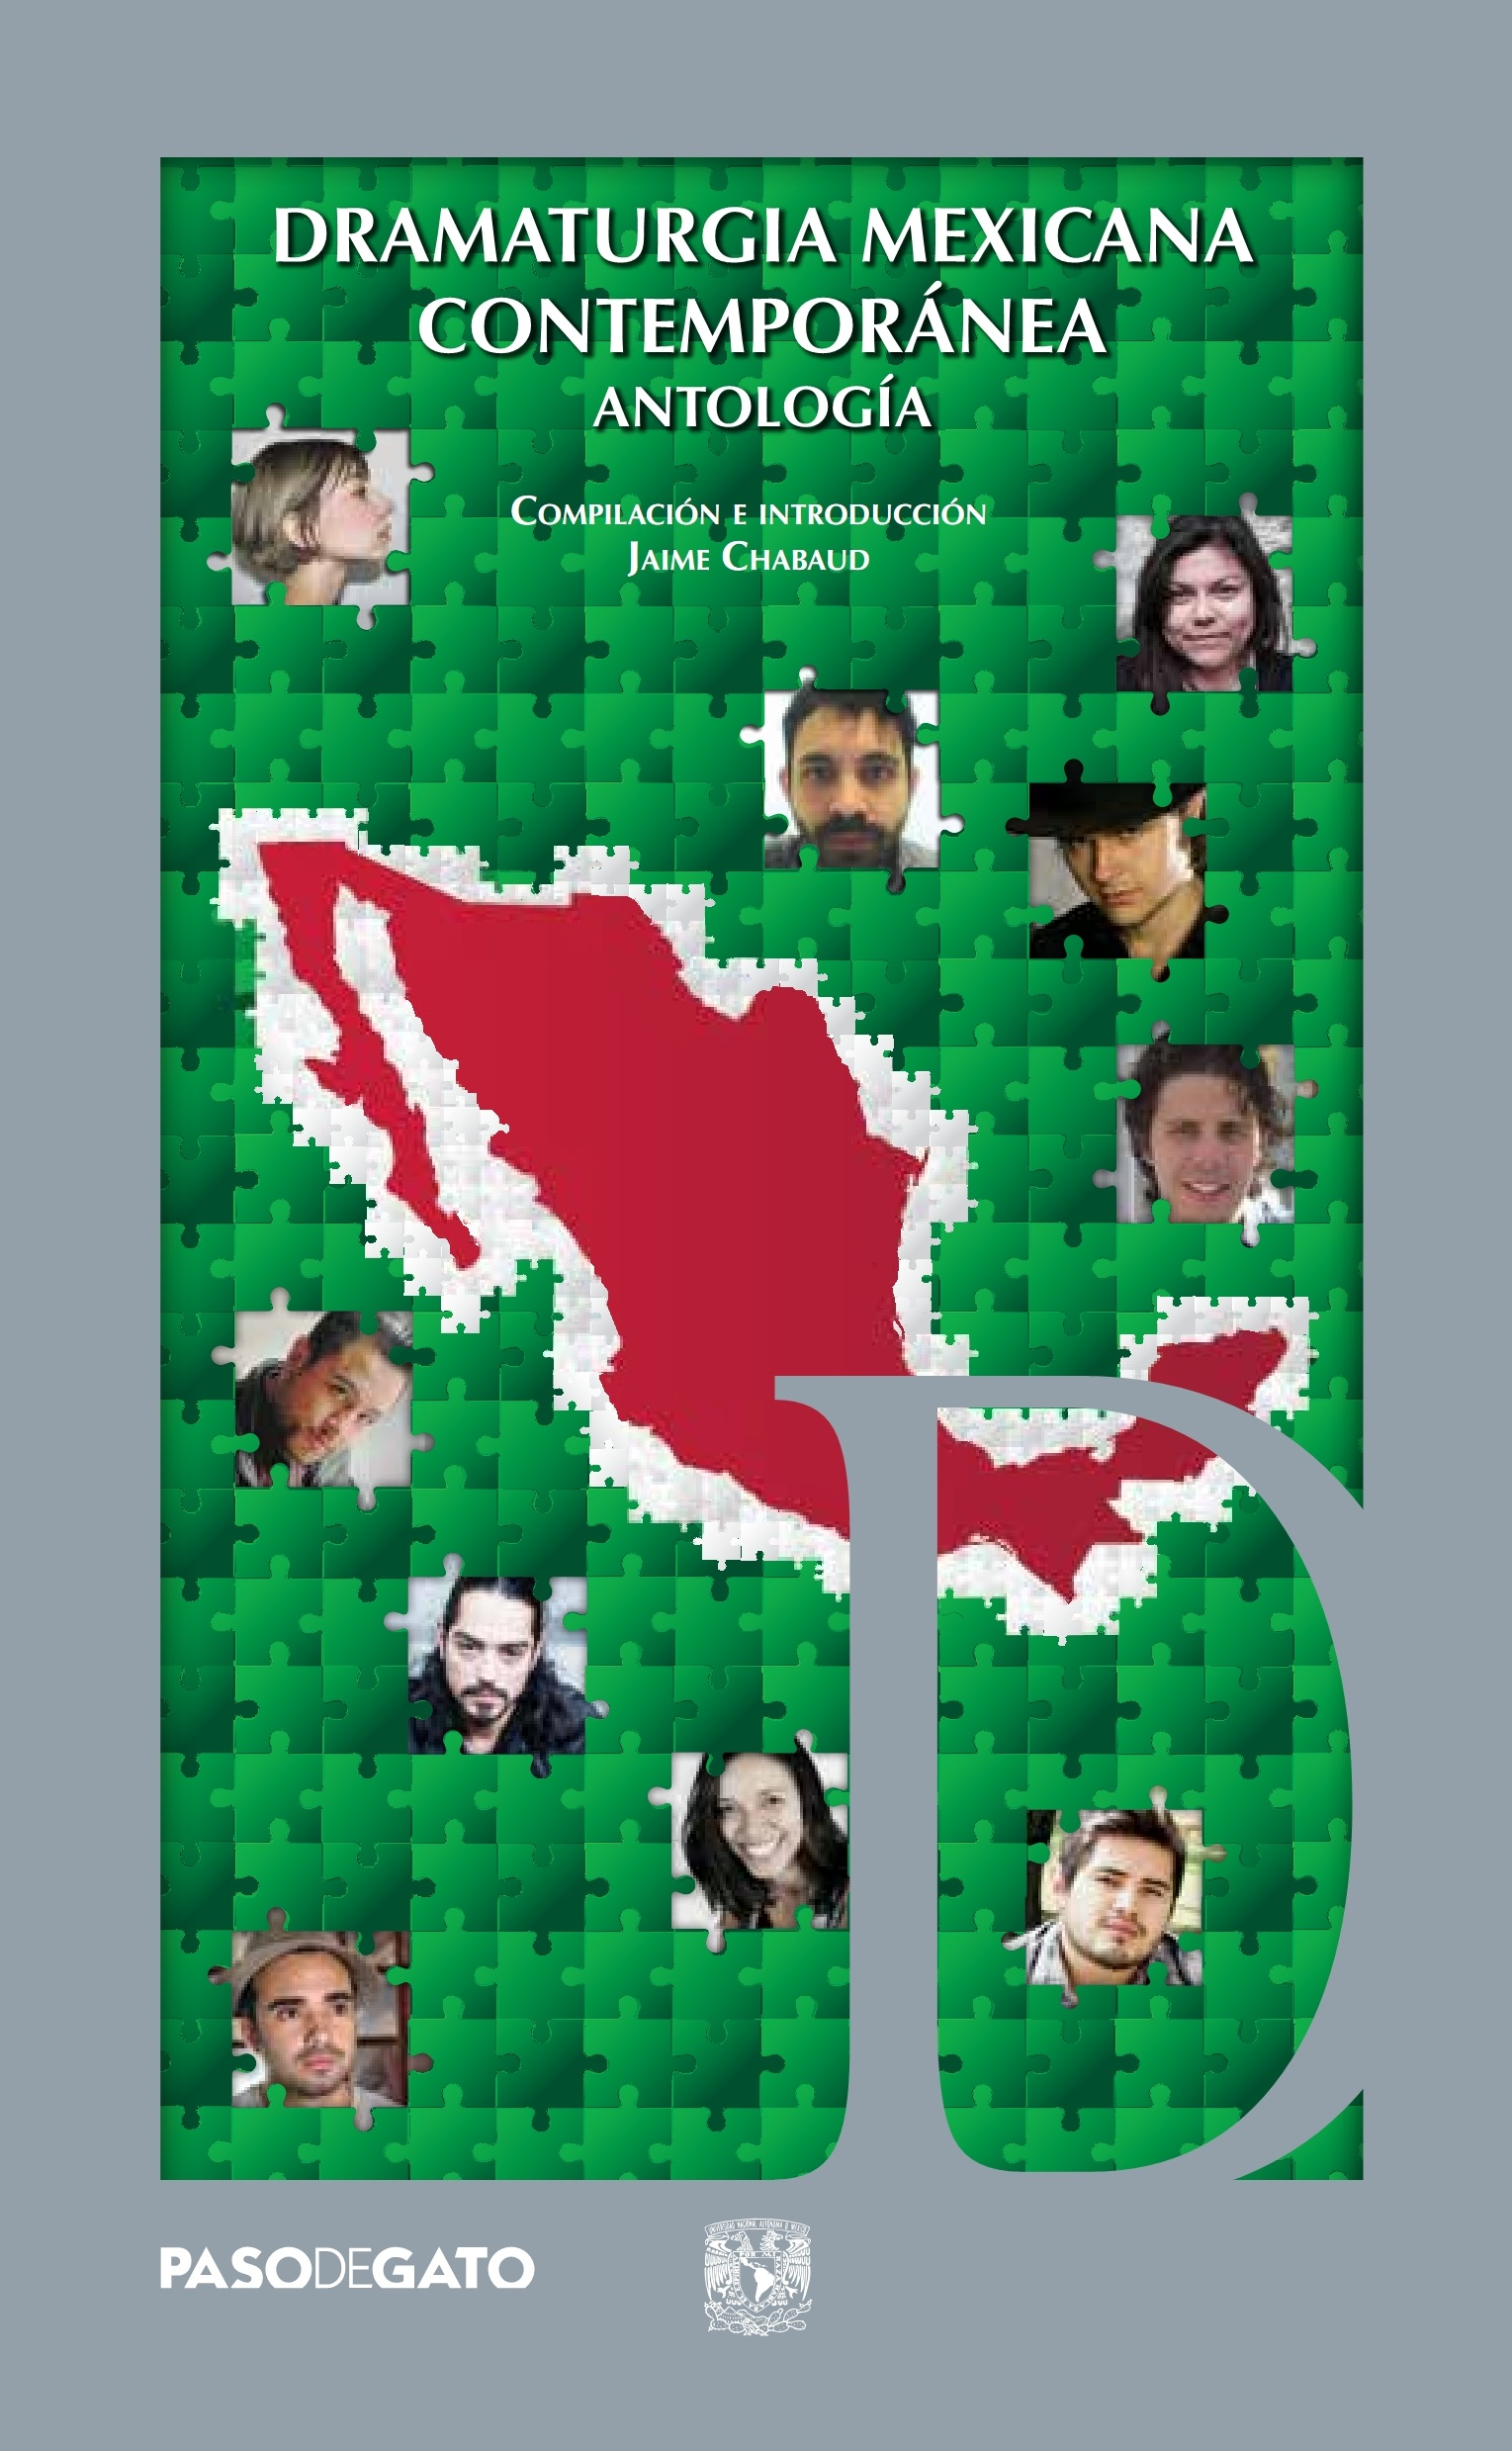 Dramaturgia mexicana contemporánea: antología I